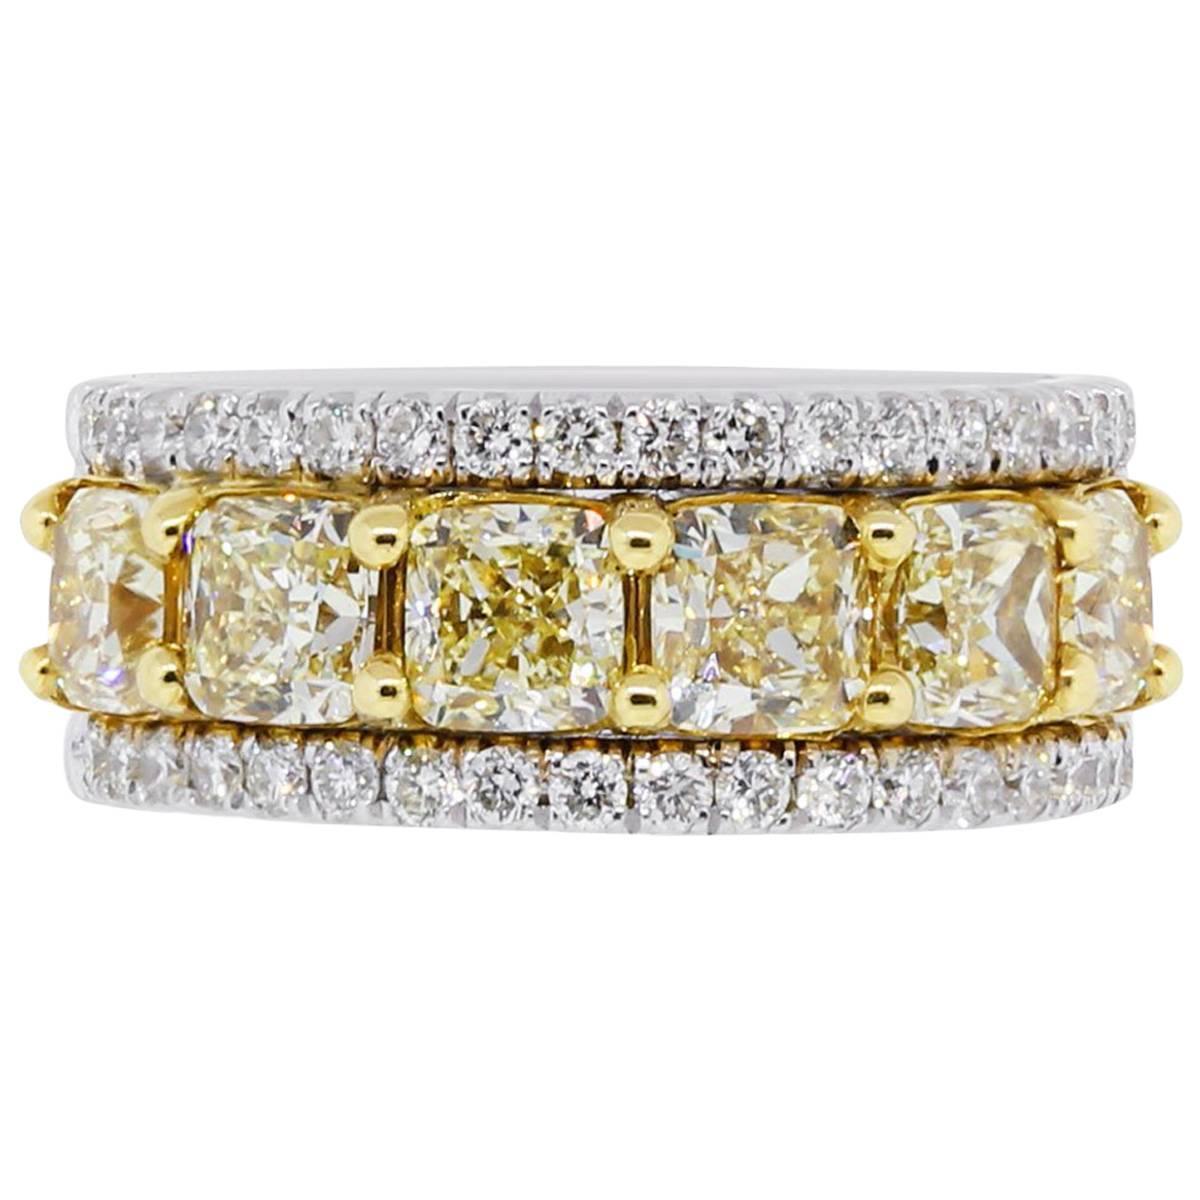 GIA Certified Fancy Yellow Radiant Cut Diamond Ring